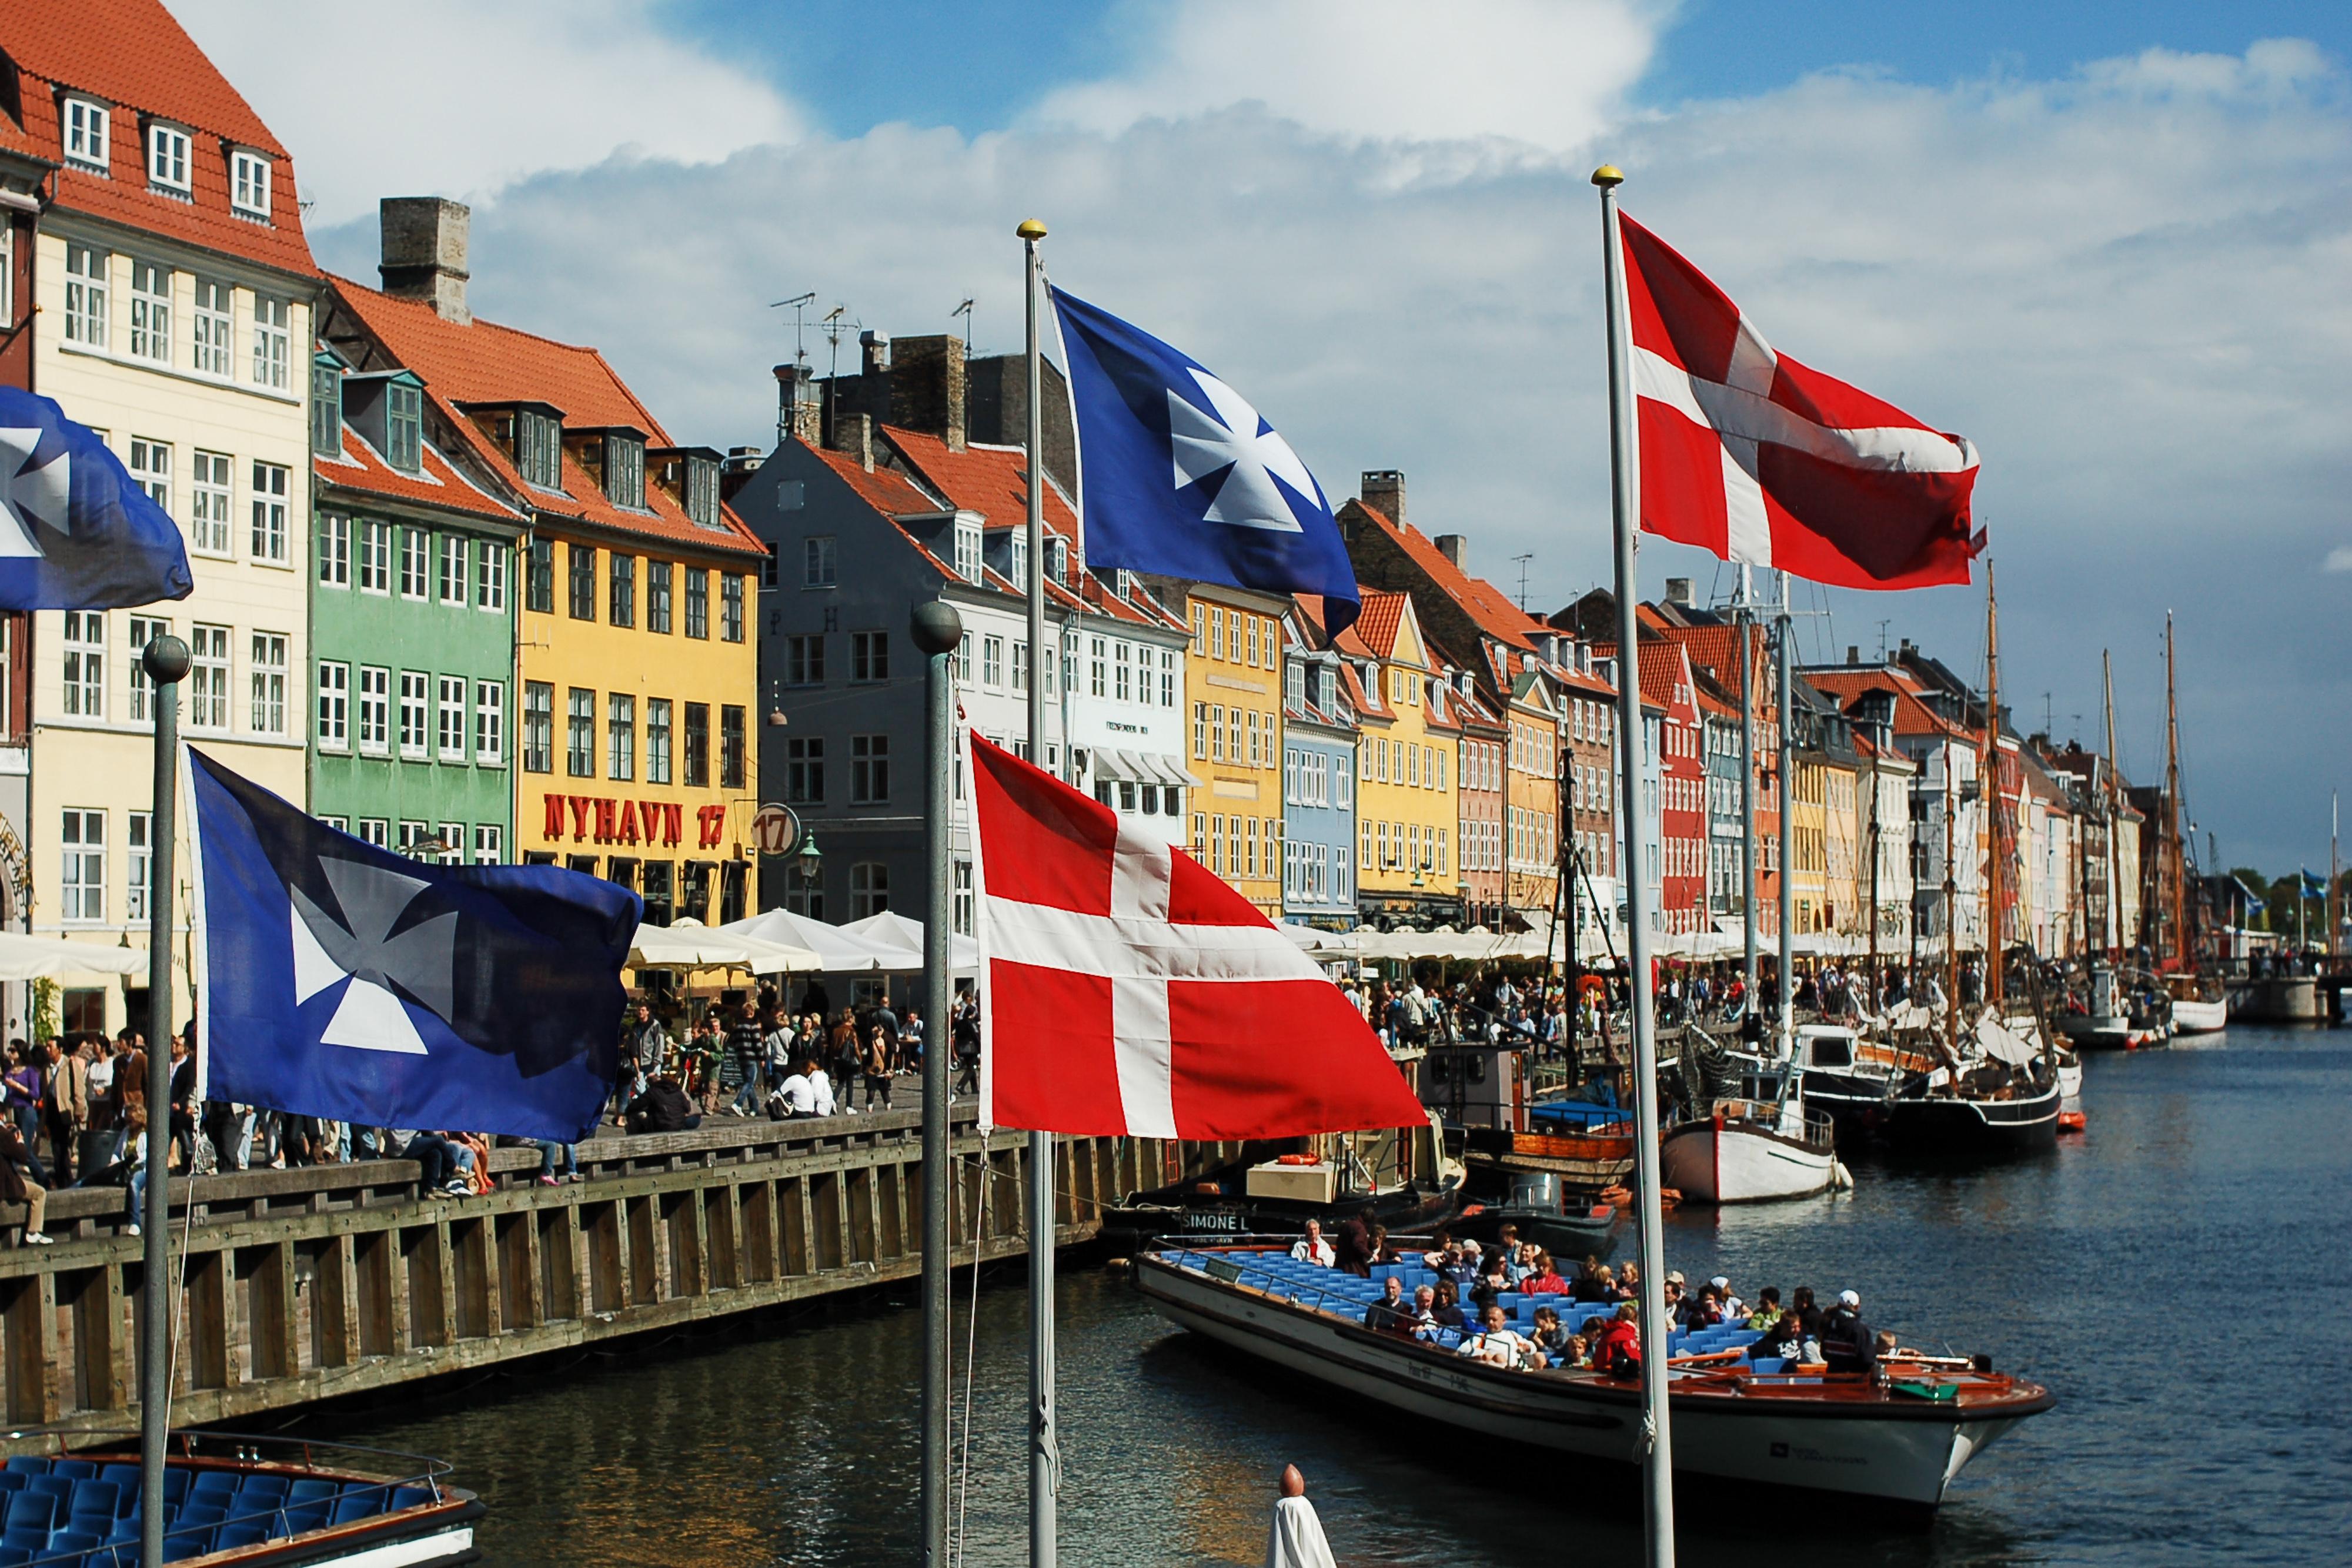 Nyhavn canal as seen from Kongens Nytorv square, Copenhagen, Denmark, Northern Europe.